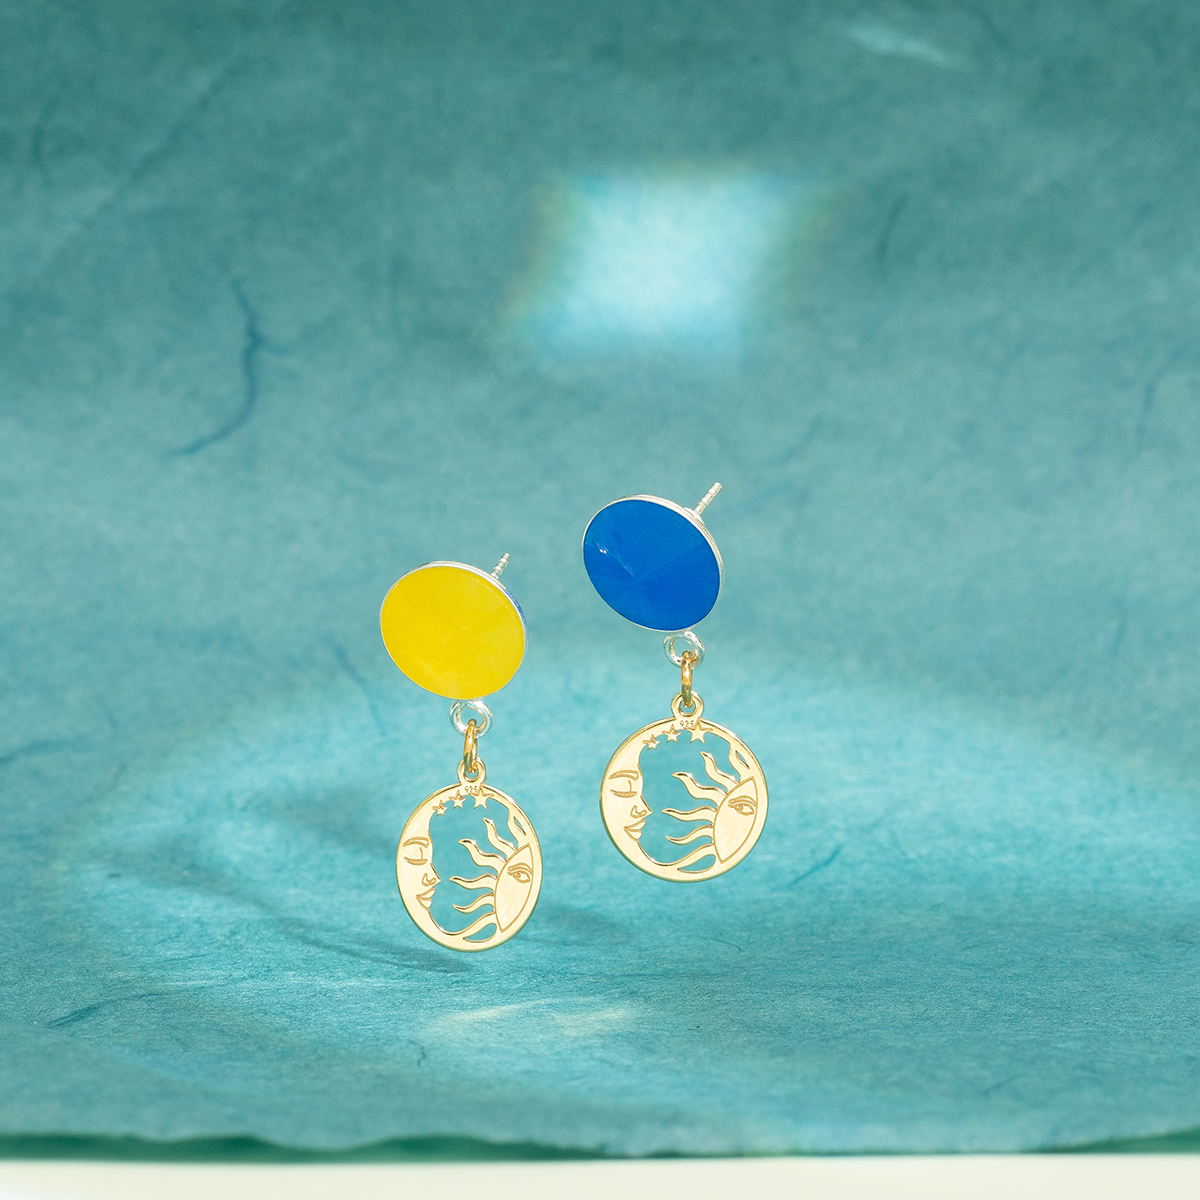 jewelry with semi precious stones